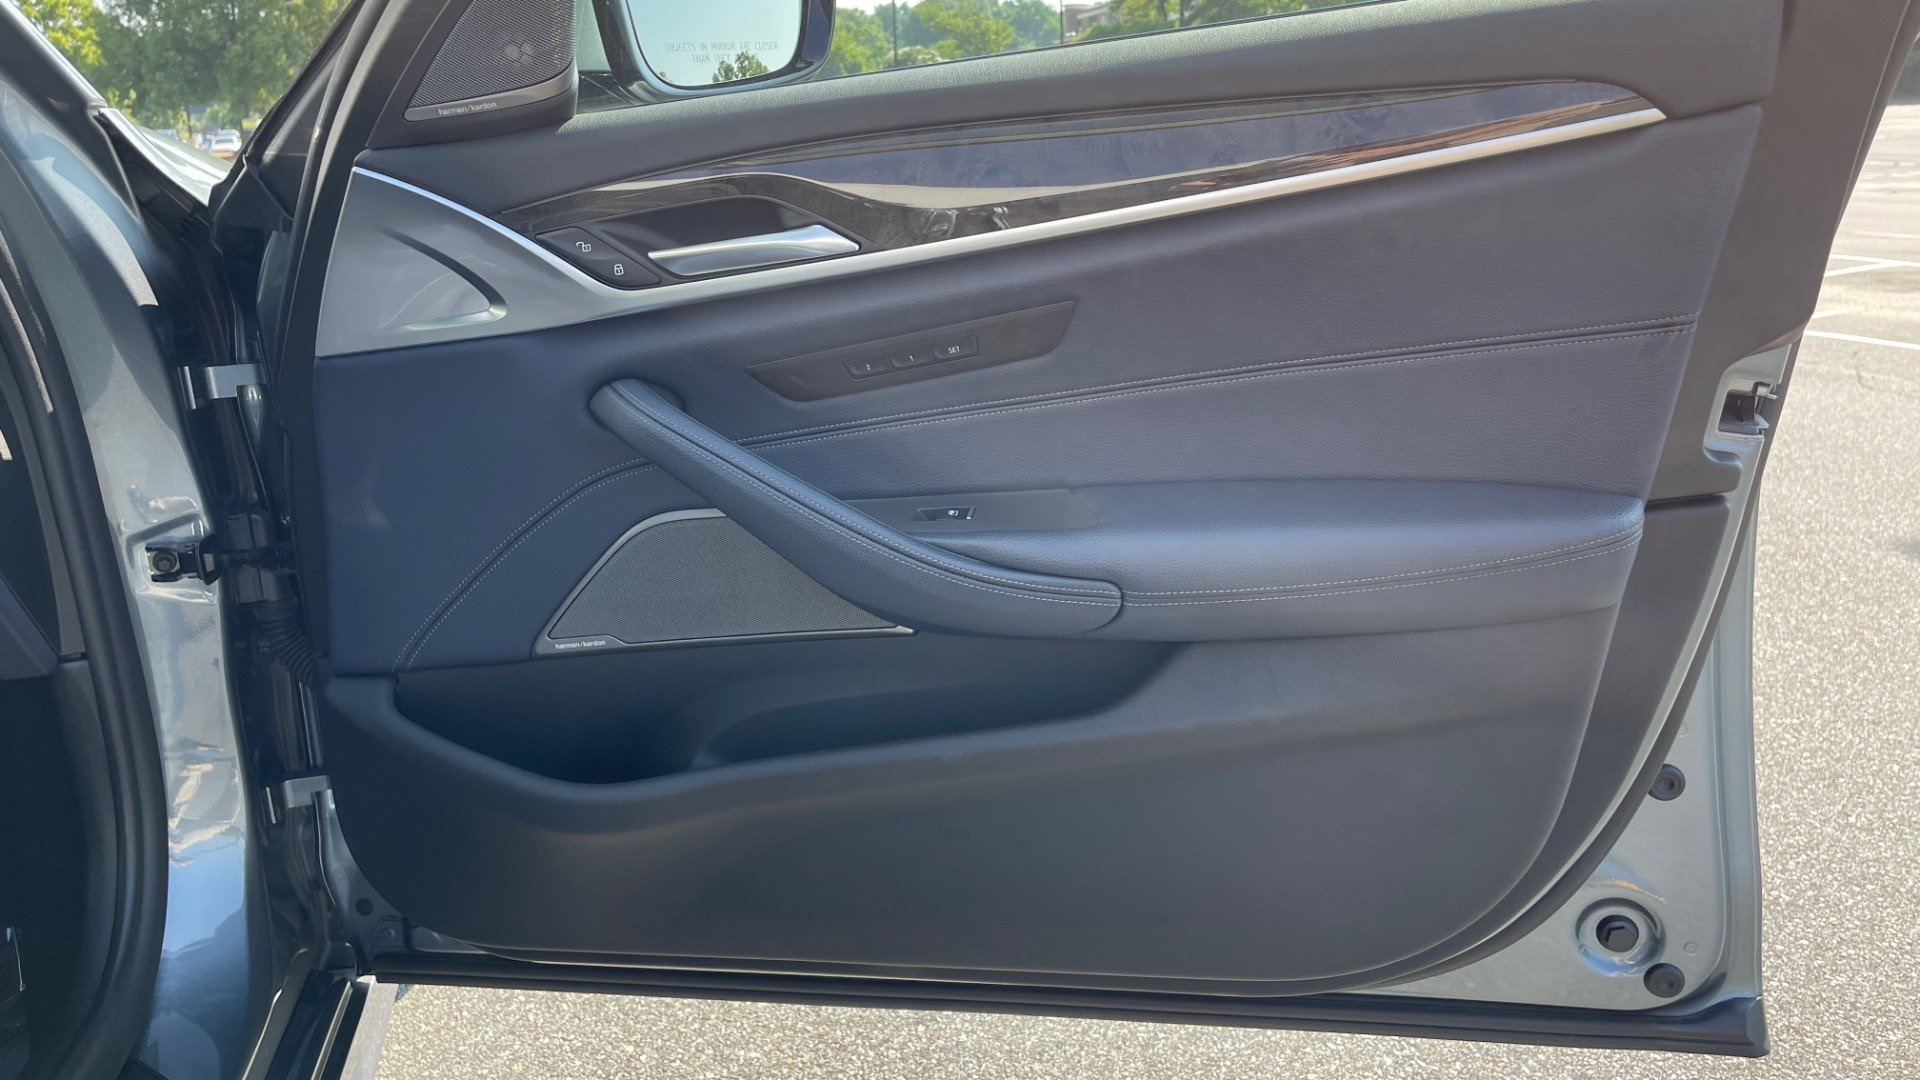 Used 2018 BMW 5 SERIES 540I XDRIVE M-SPORT / DRVR ASST / PDC / APPLE / HUD / H/K SND for sale $42,795 at Formula Imports in Charlotte NC 28227 64